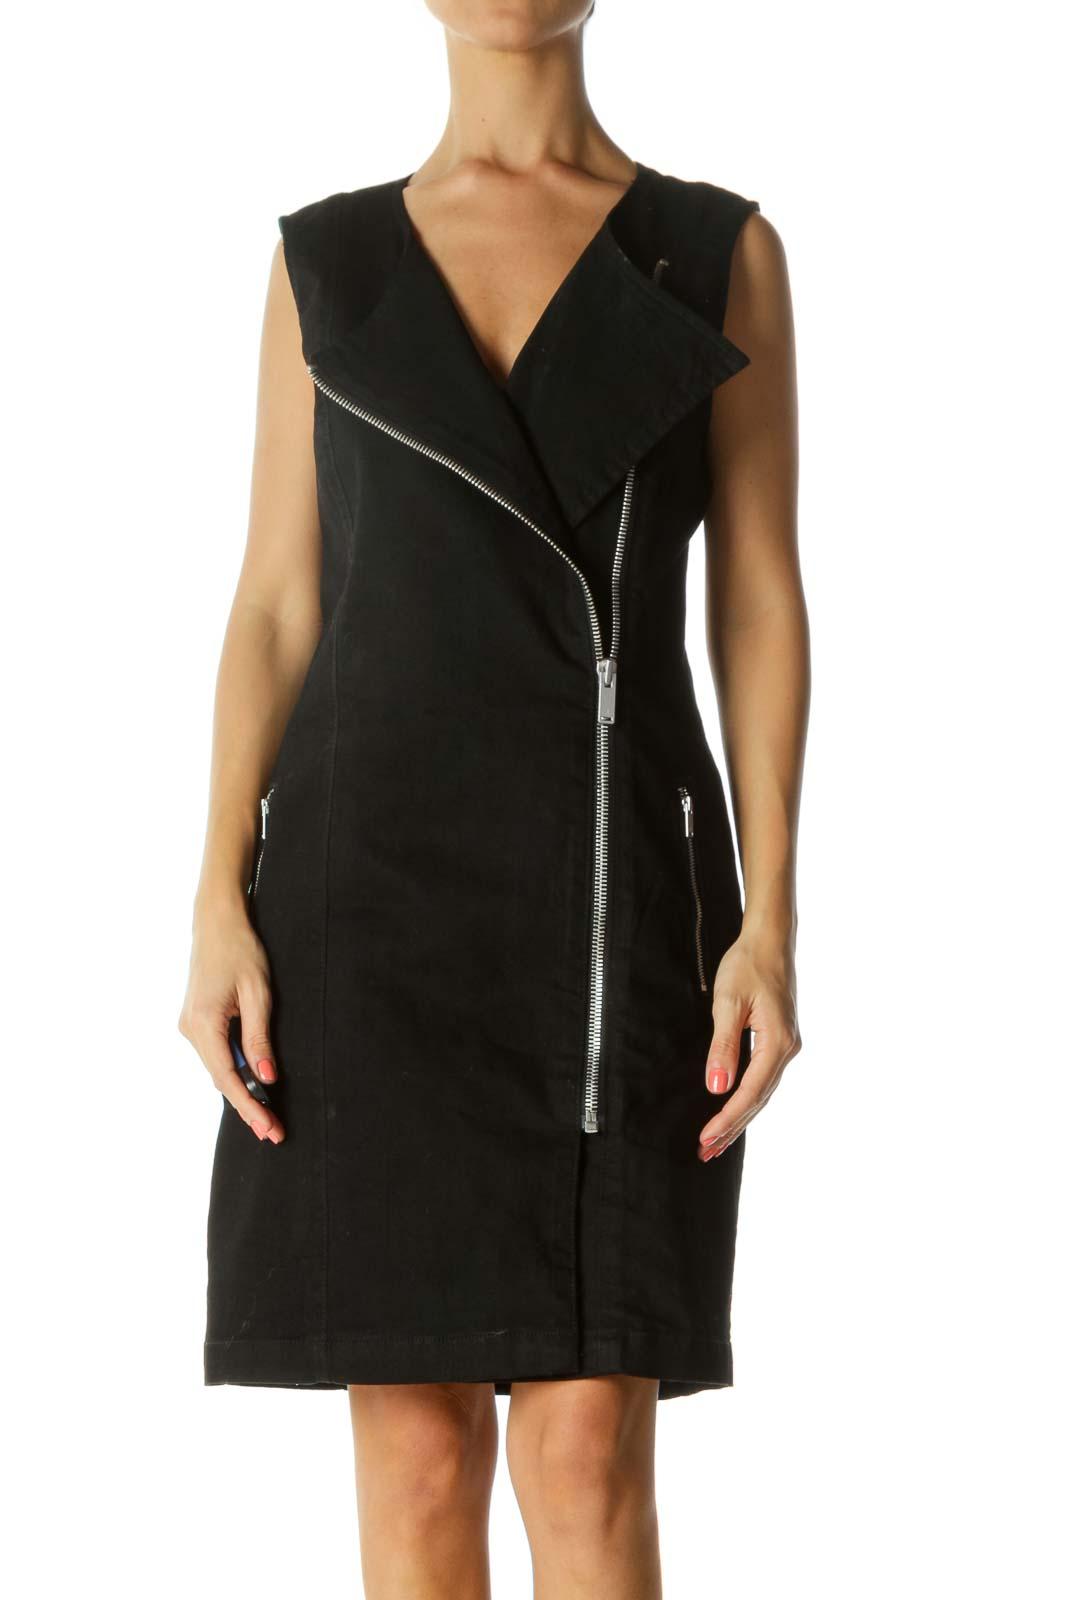 Black Side Zipper Work Dress Front